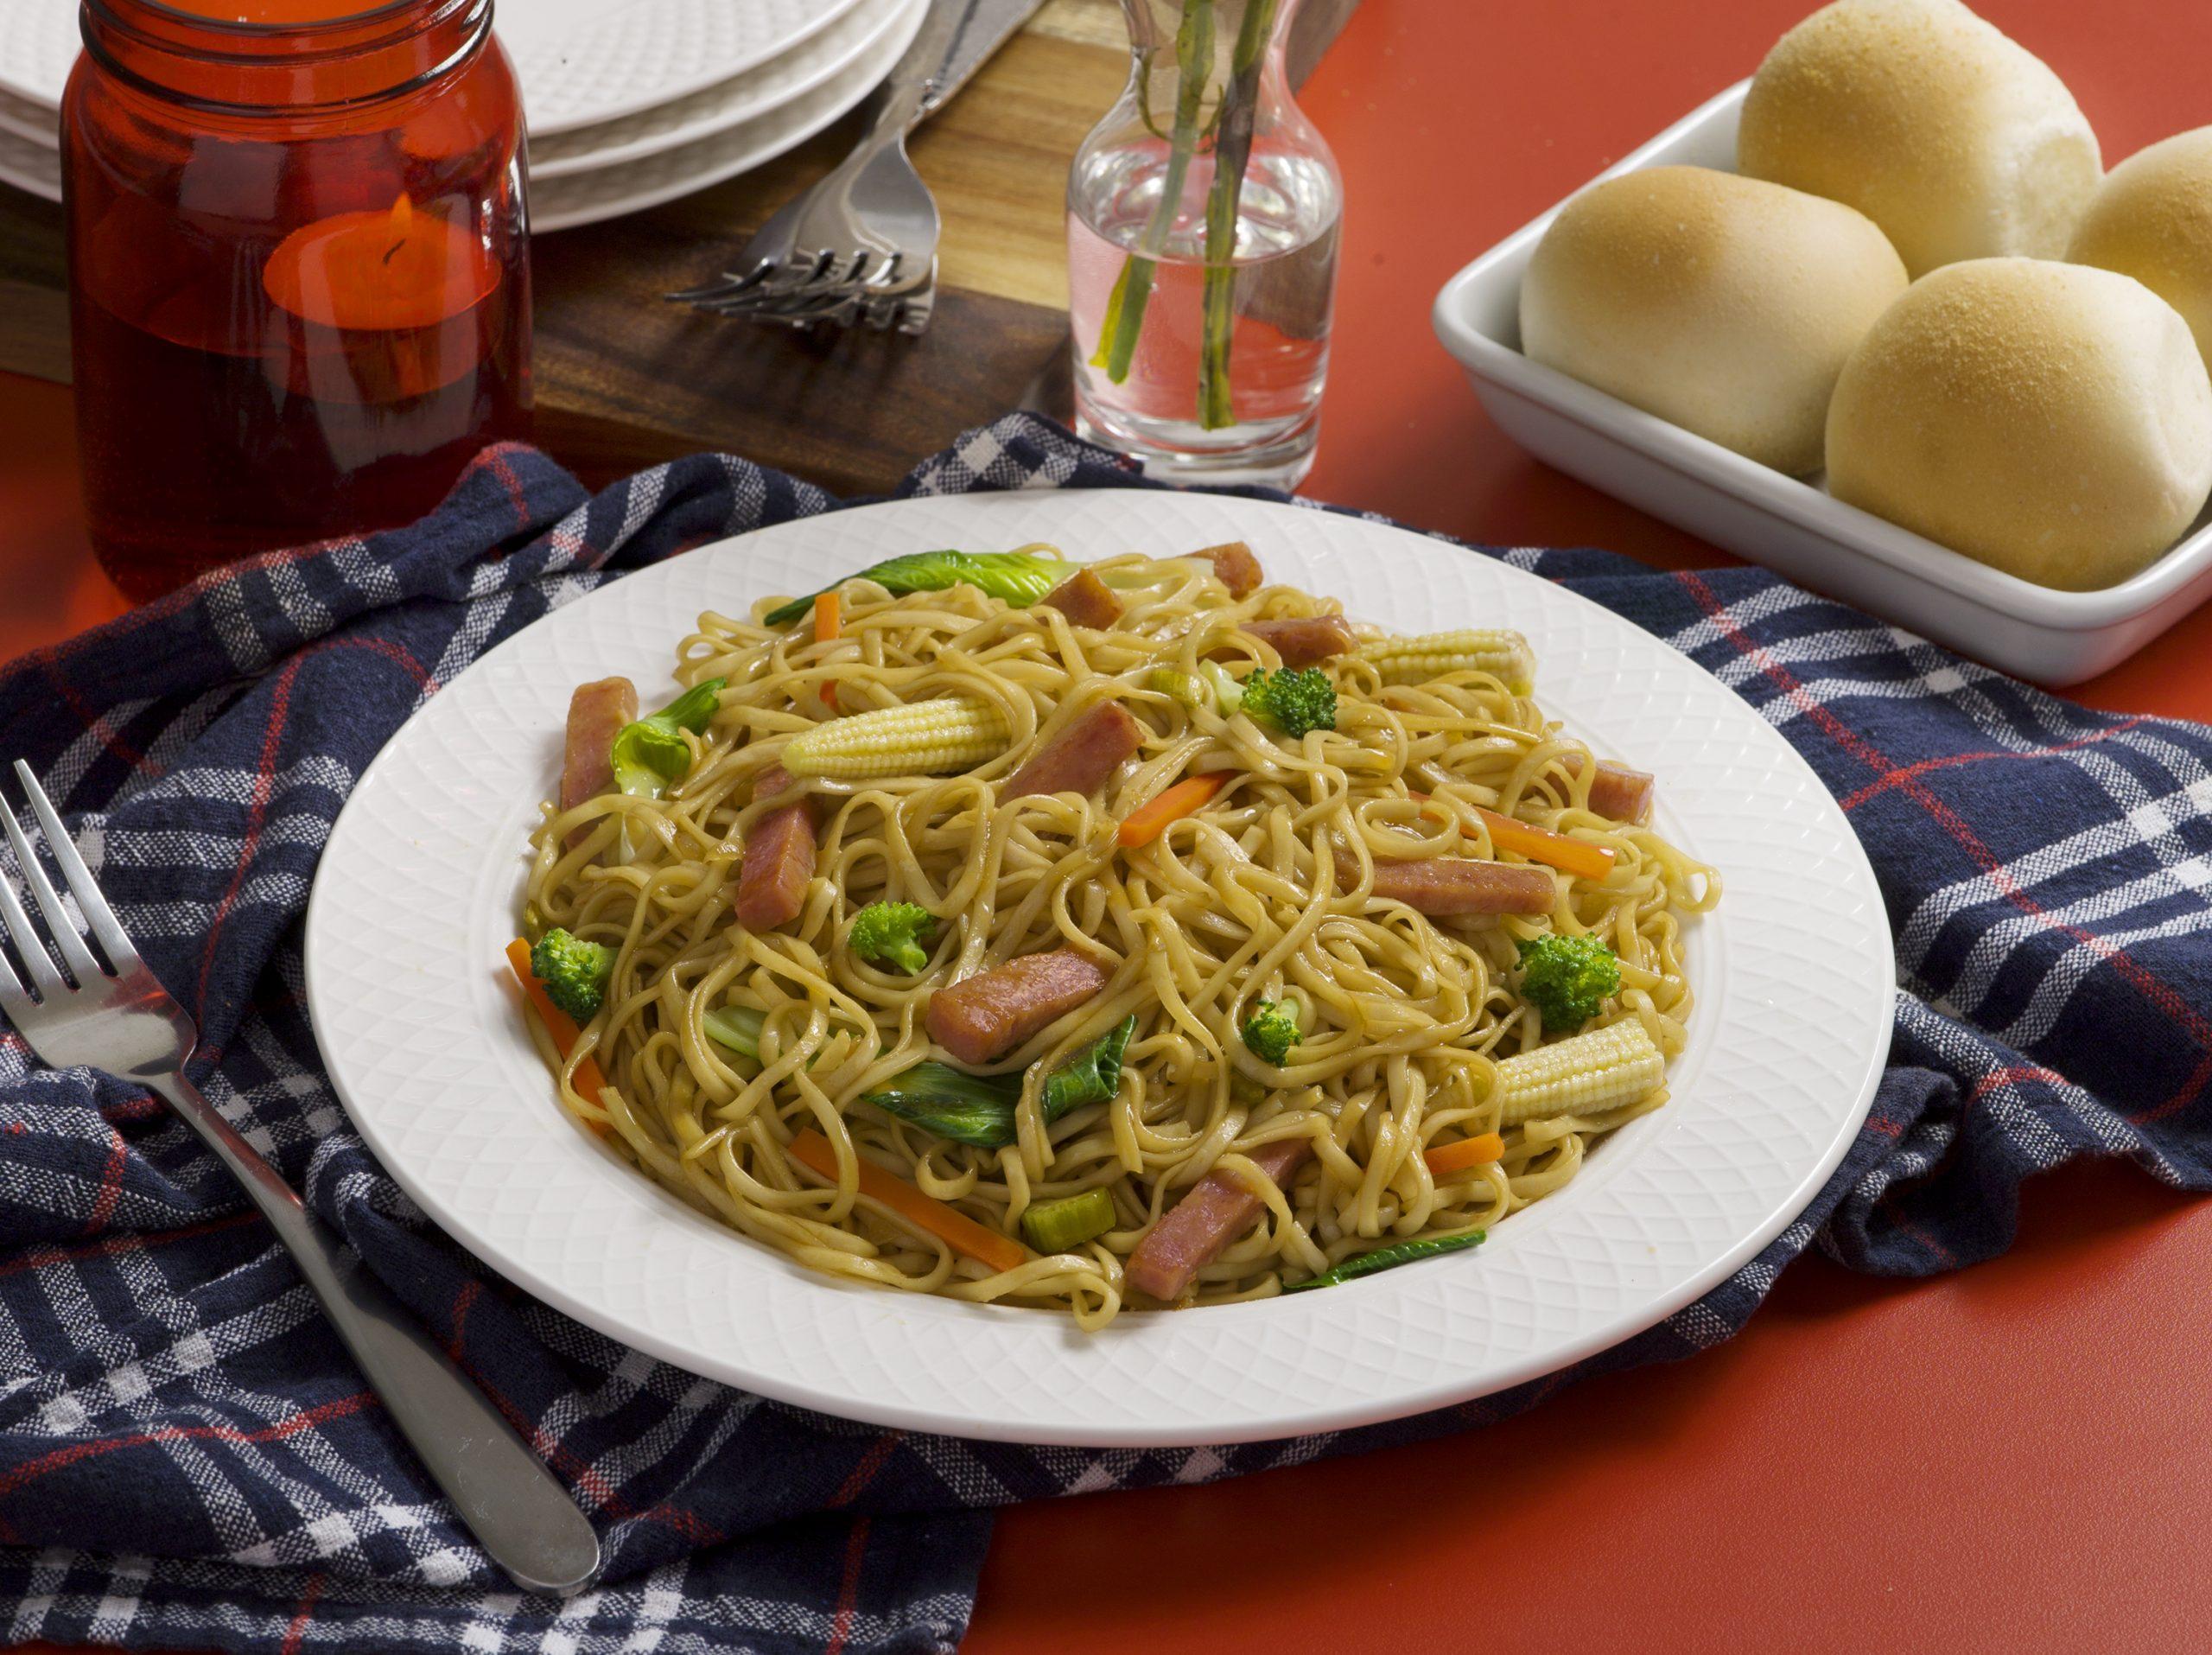 https://spambrand.com.au/recipe/spam-canton-noodles/